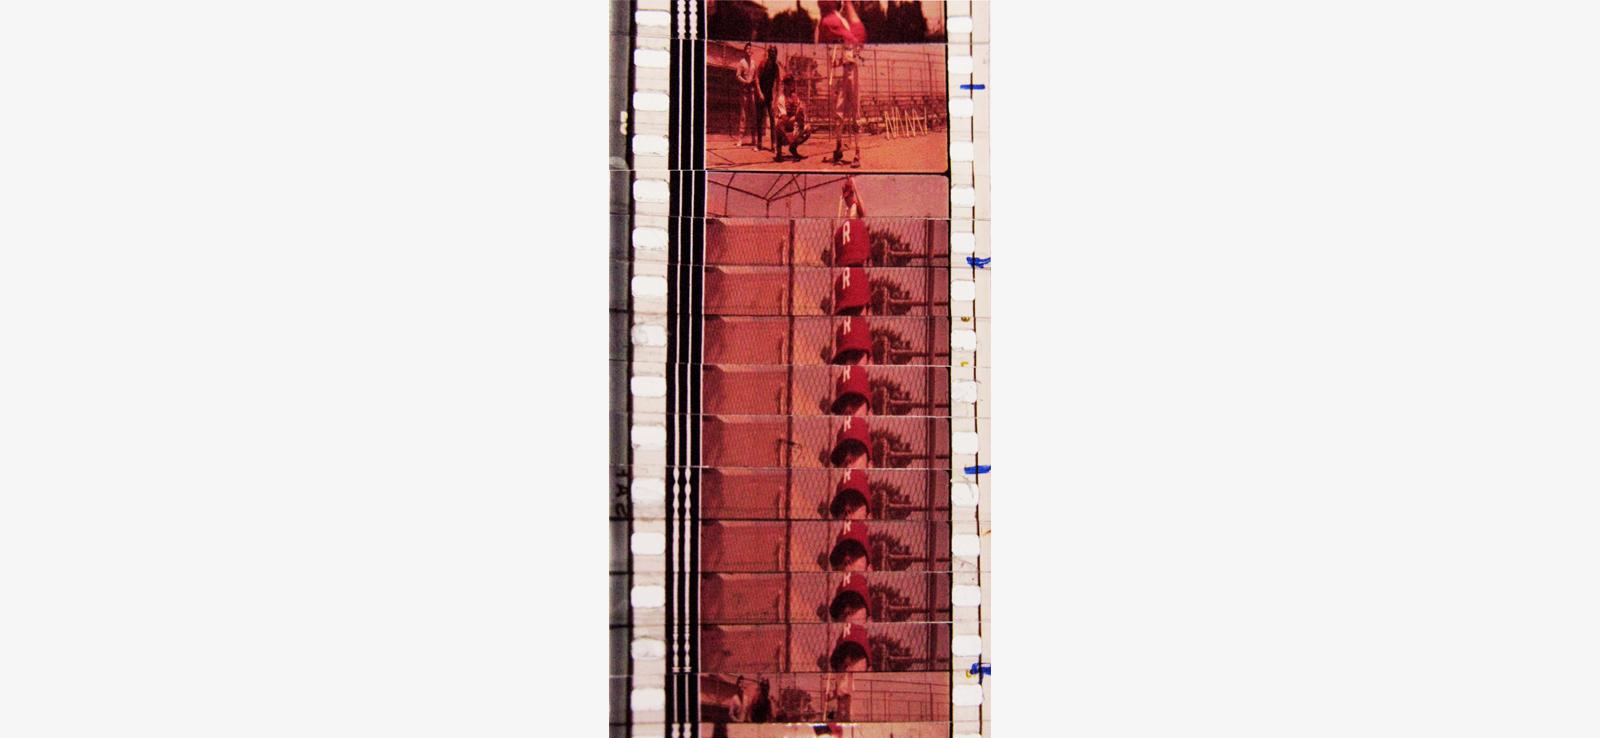 Antoni Pinent G/R/E/A/S/E experimental animation film's frame